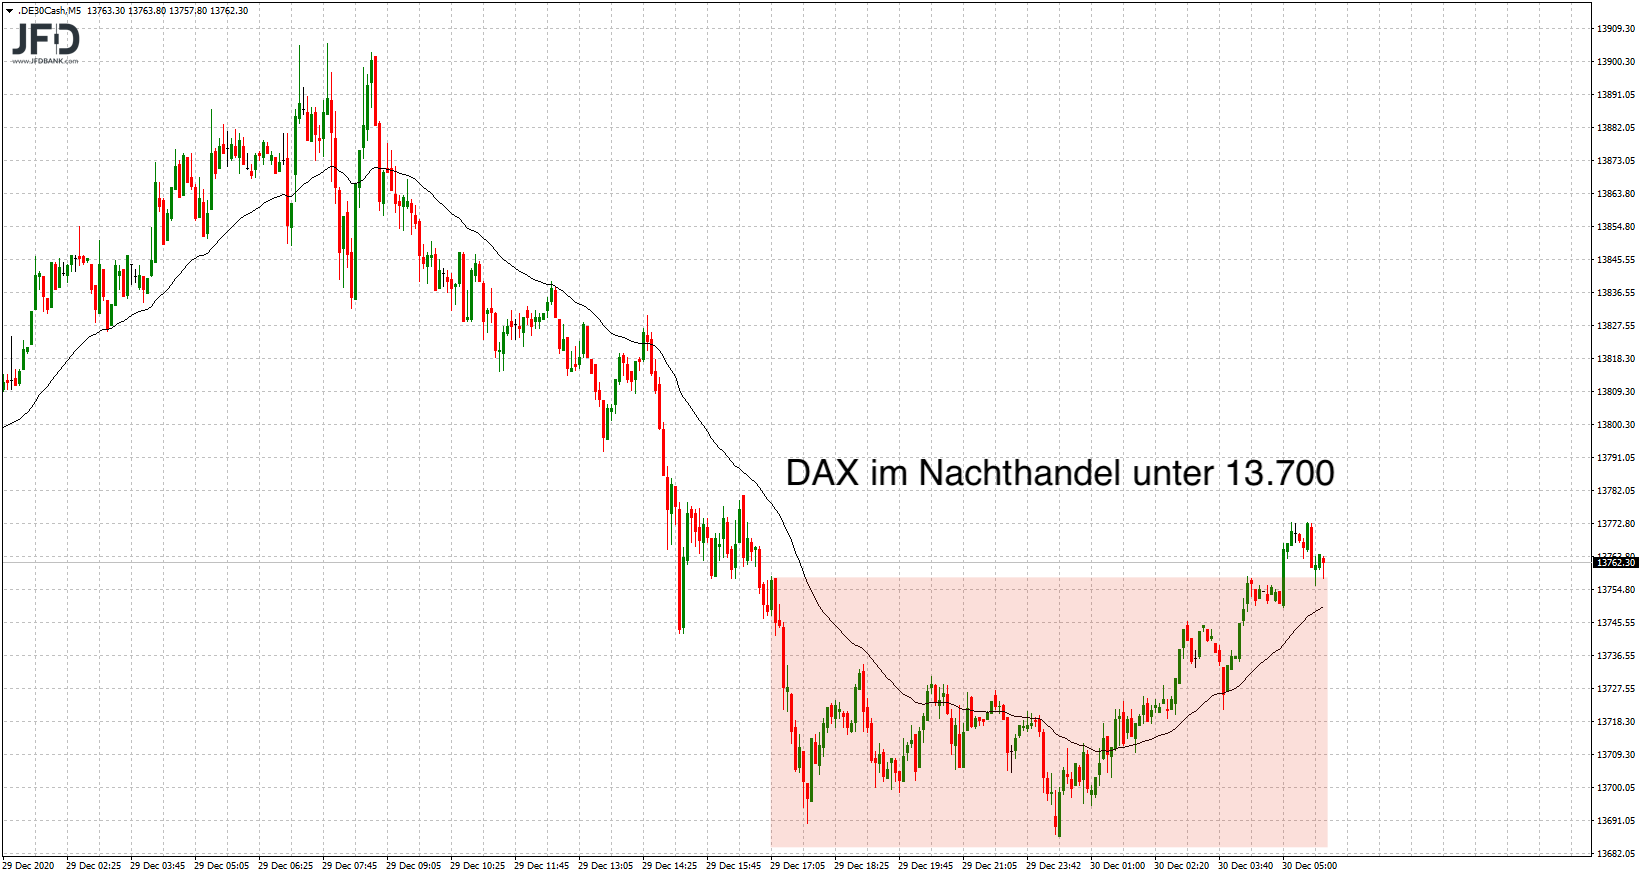 DAX-Vorbörse im Blick